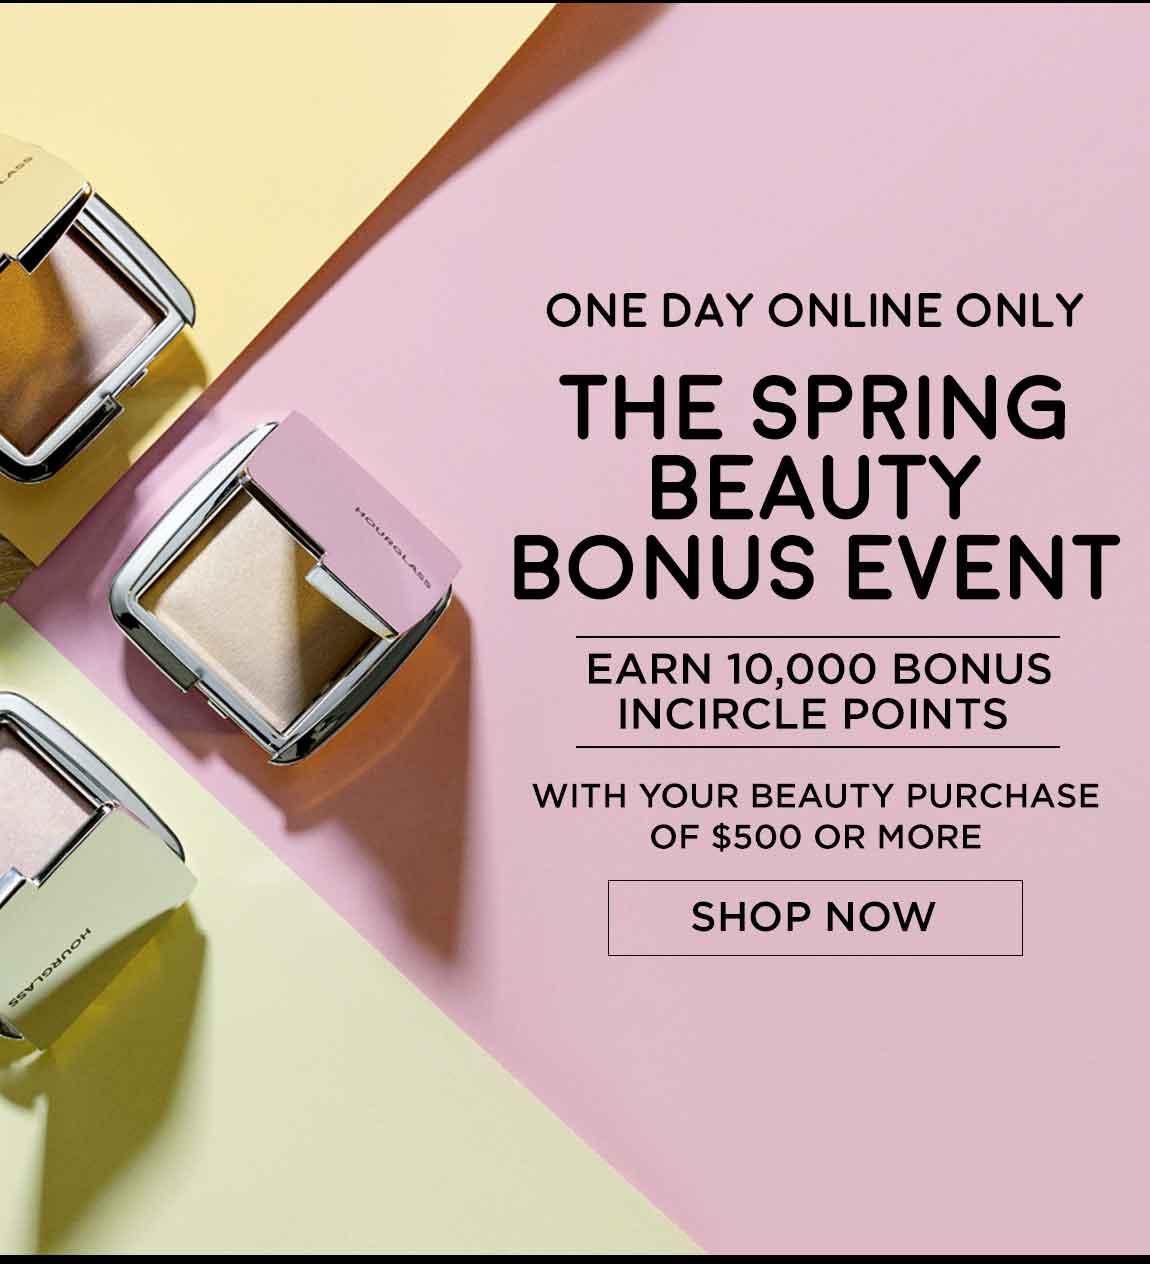 Prada, Jimmy Choo, Gucci, Lanvin, Dolce \u0026amp; Gabbana | Bergdorf Goodman